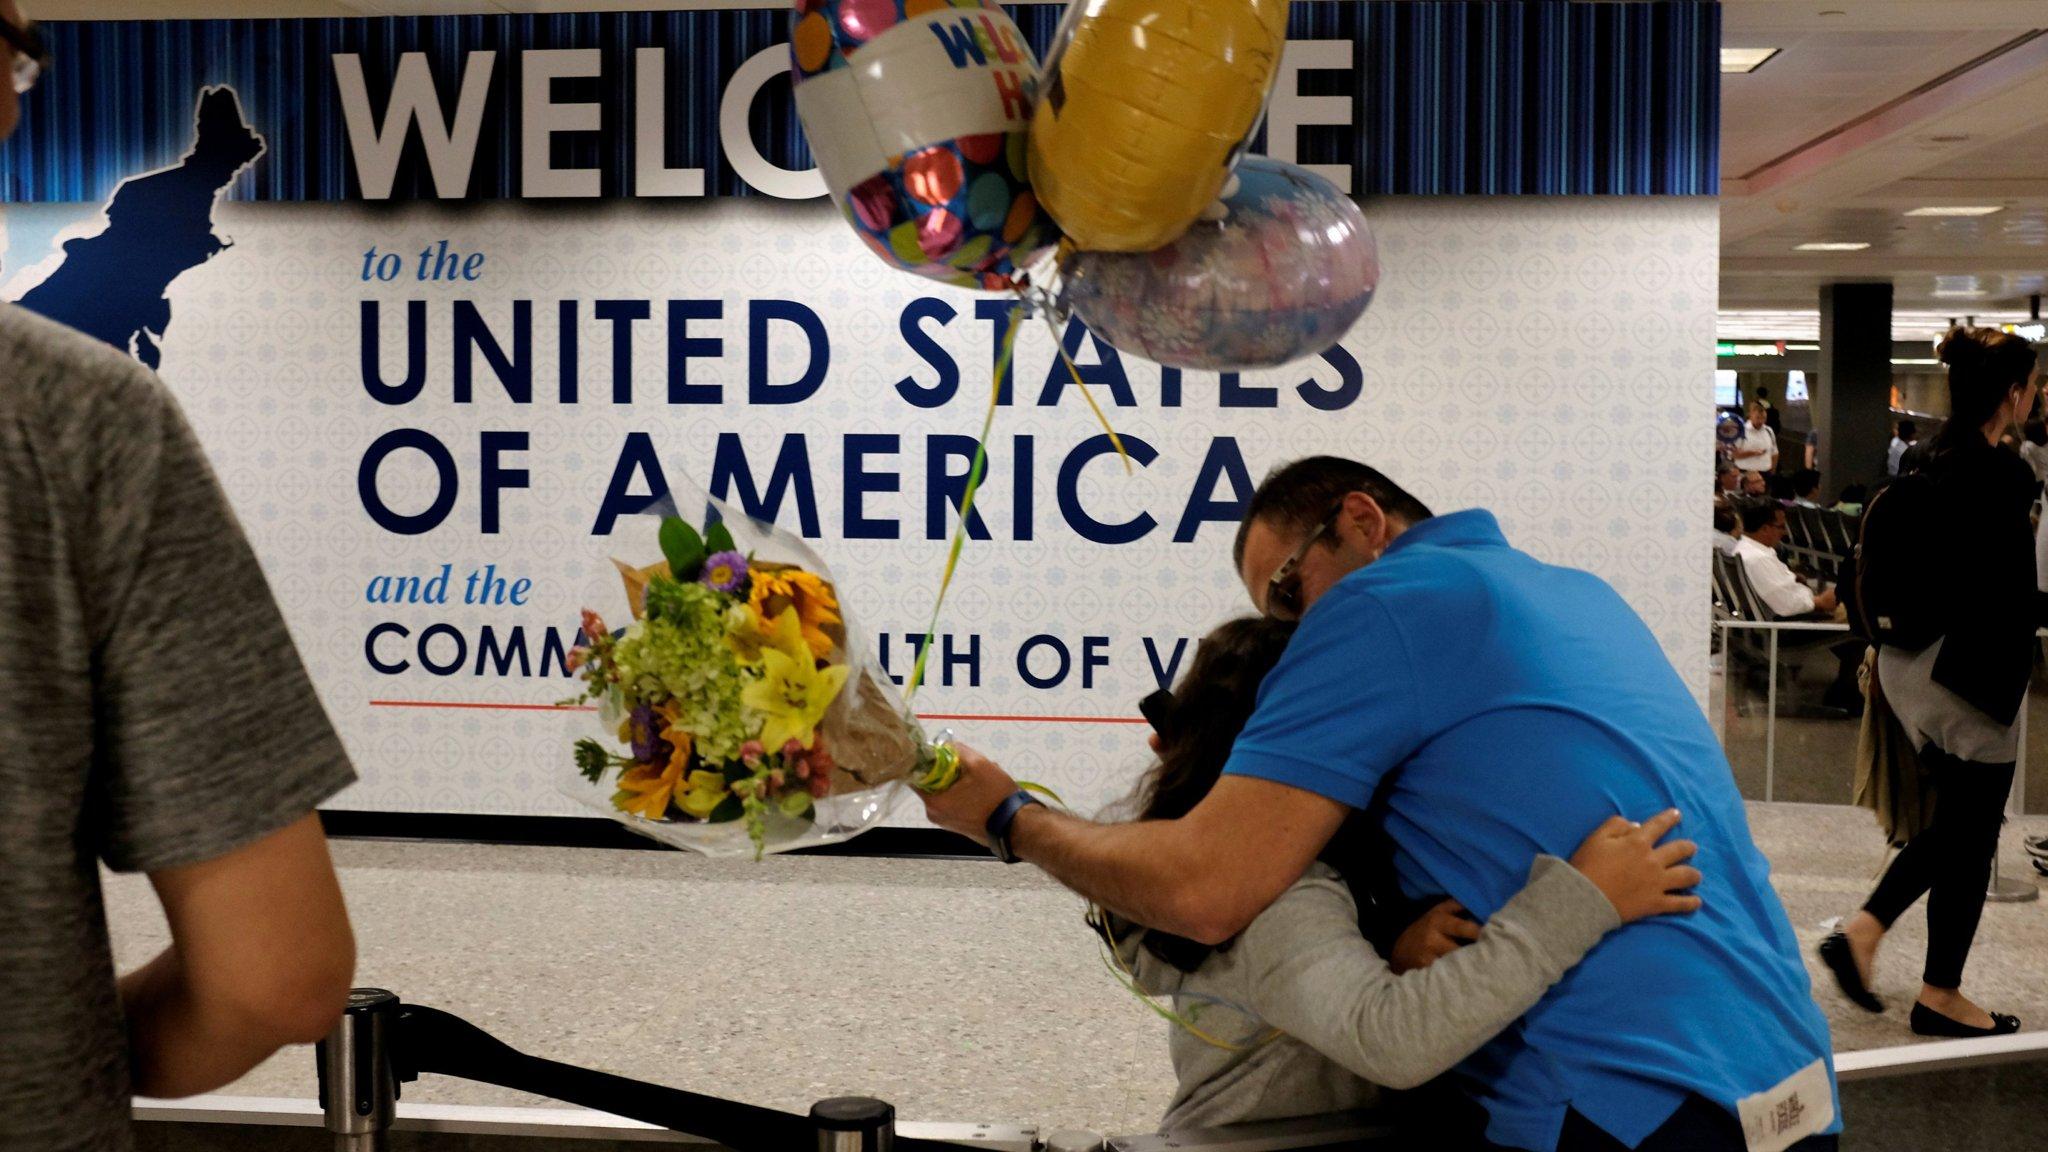 Supreme Court ruling backs Trump travel ban